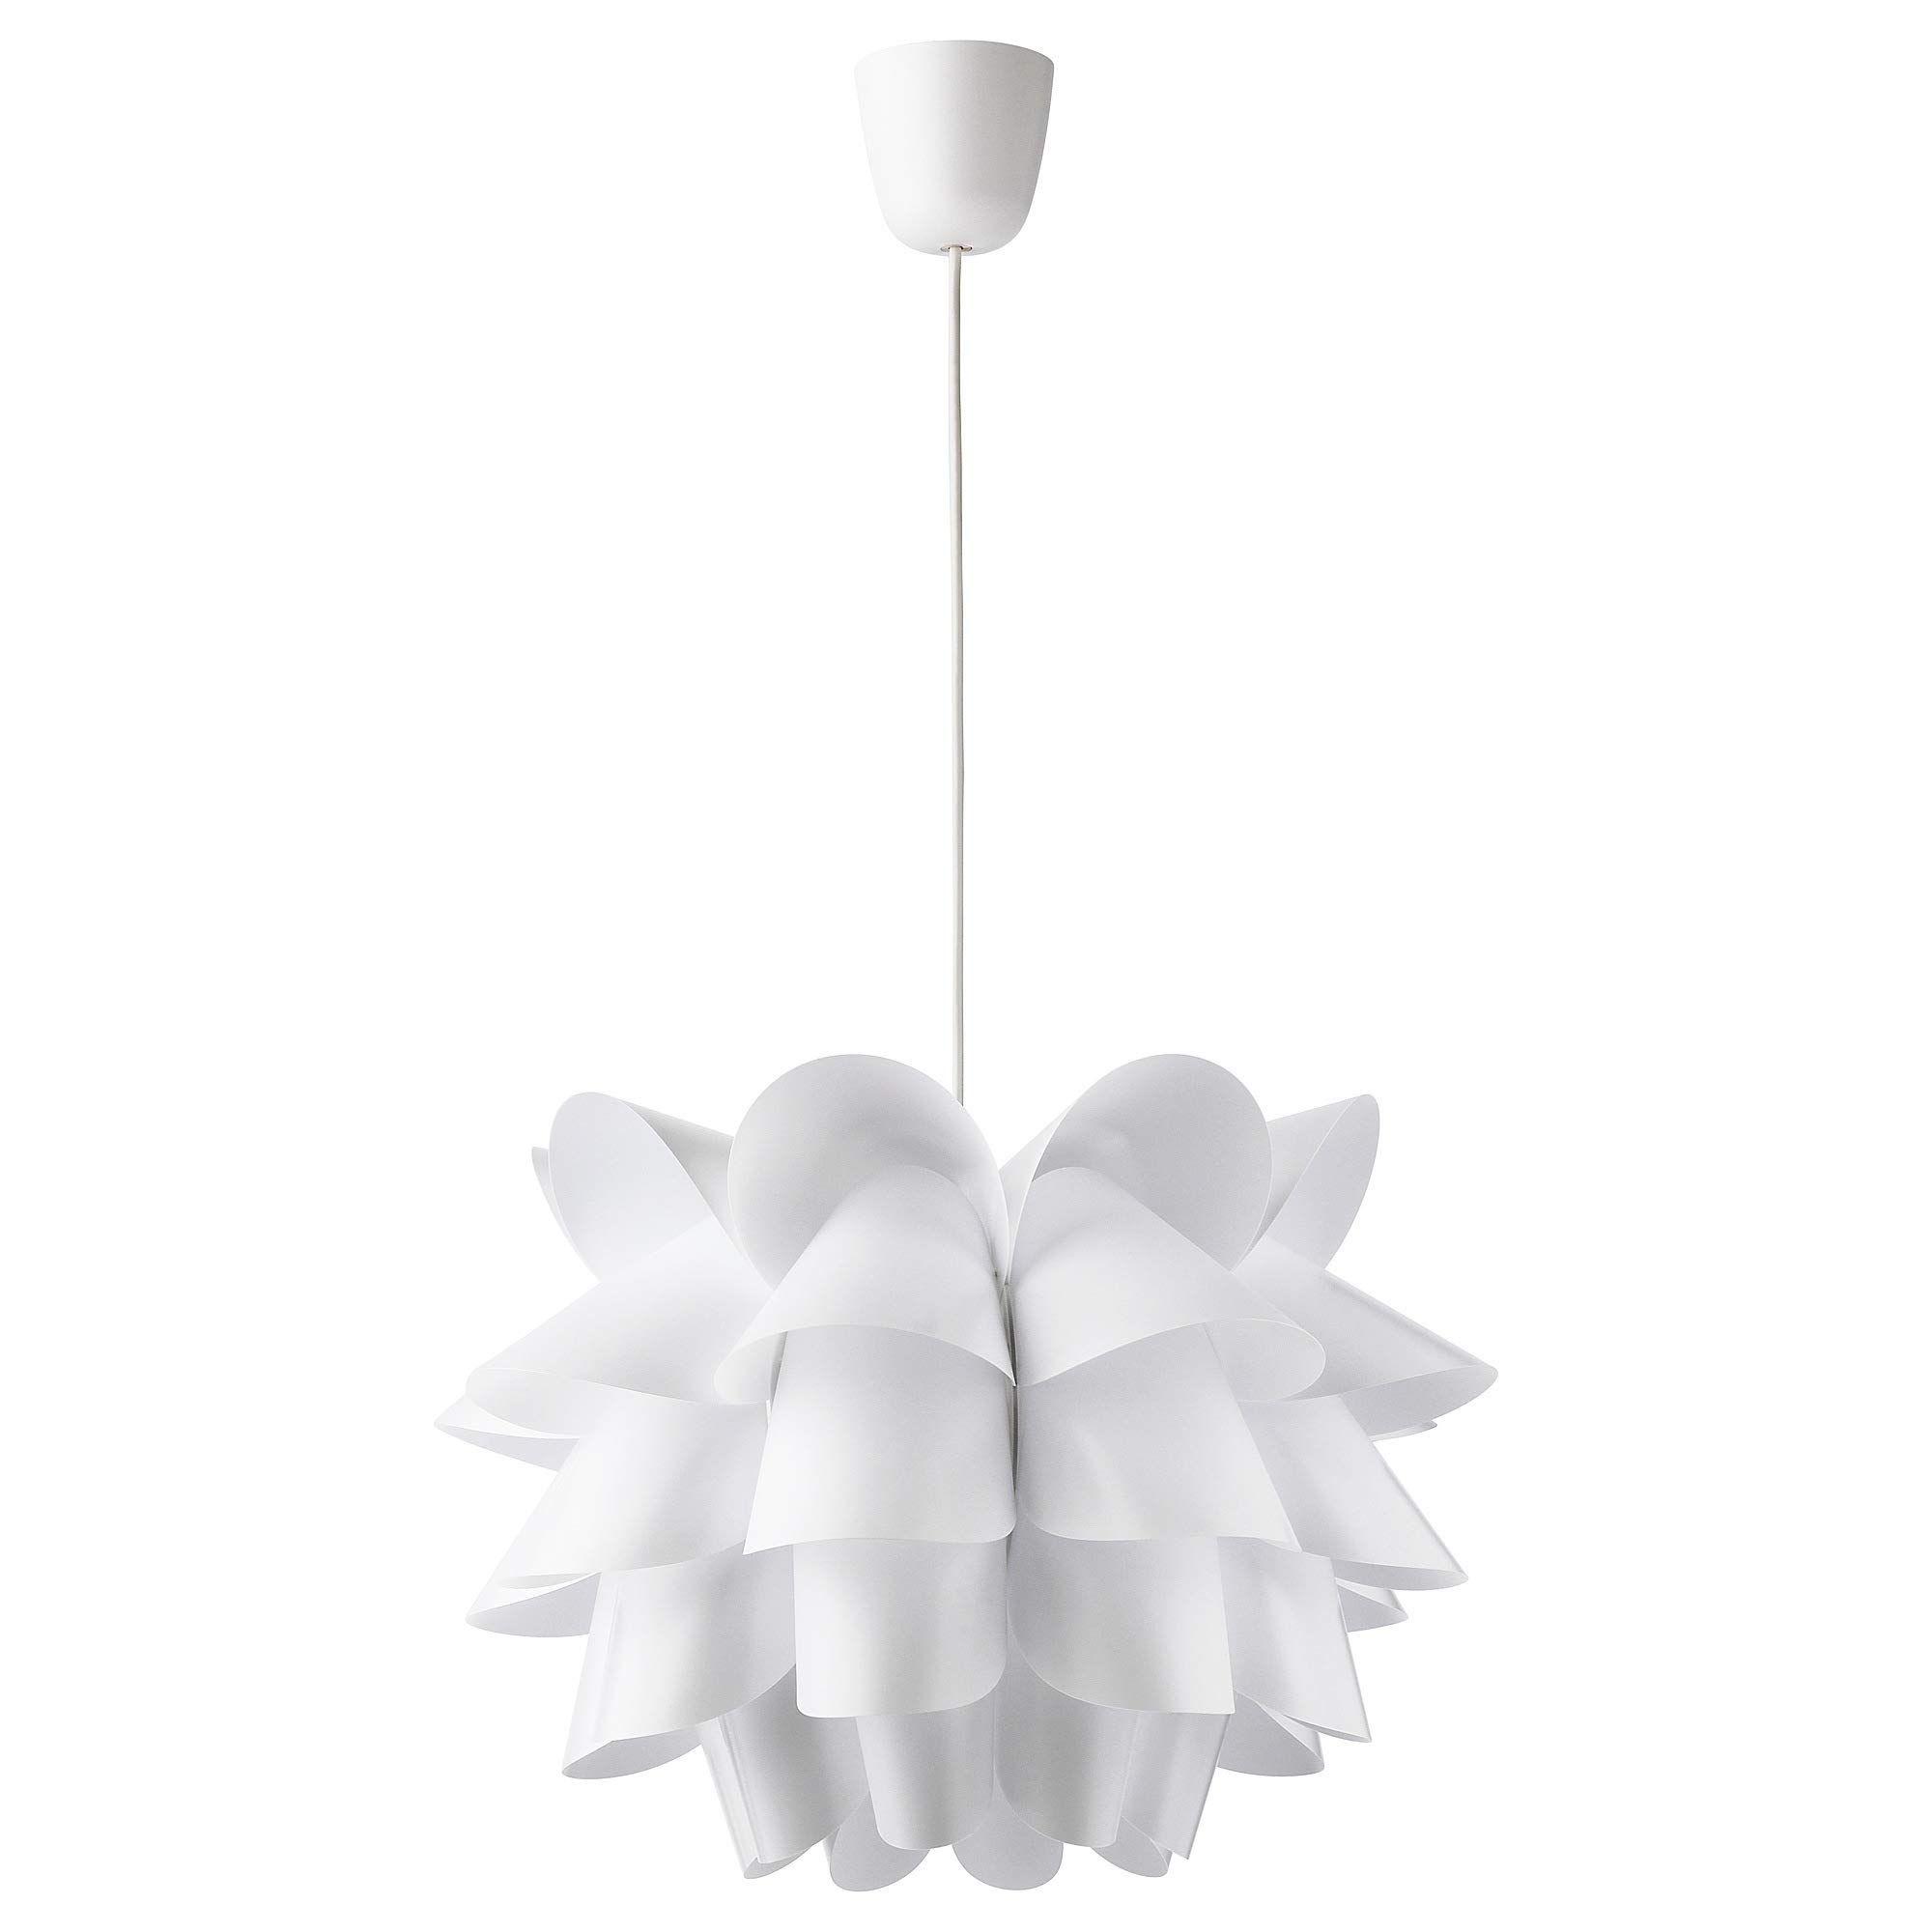 Ikea Fba 600 713 44 600 713 44 Knappa Pendant Lamp White In 2020 Pendant Lamp White Pendant Lamp Lamp